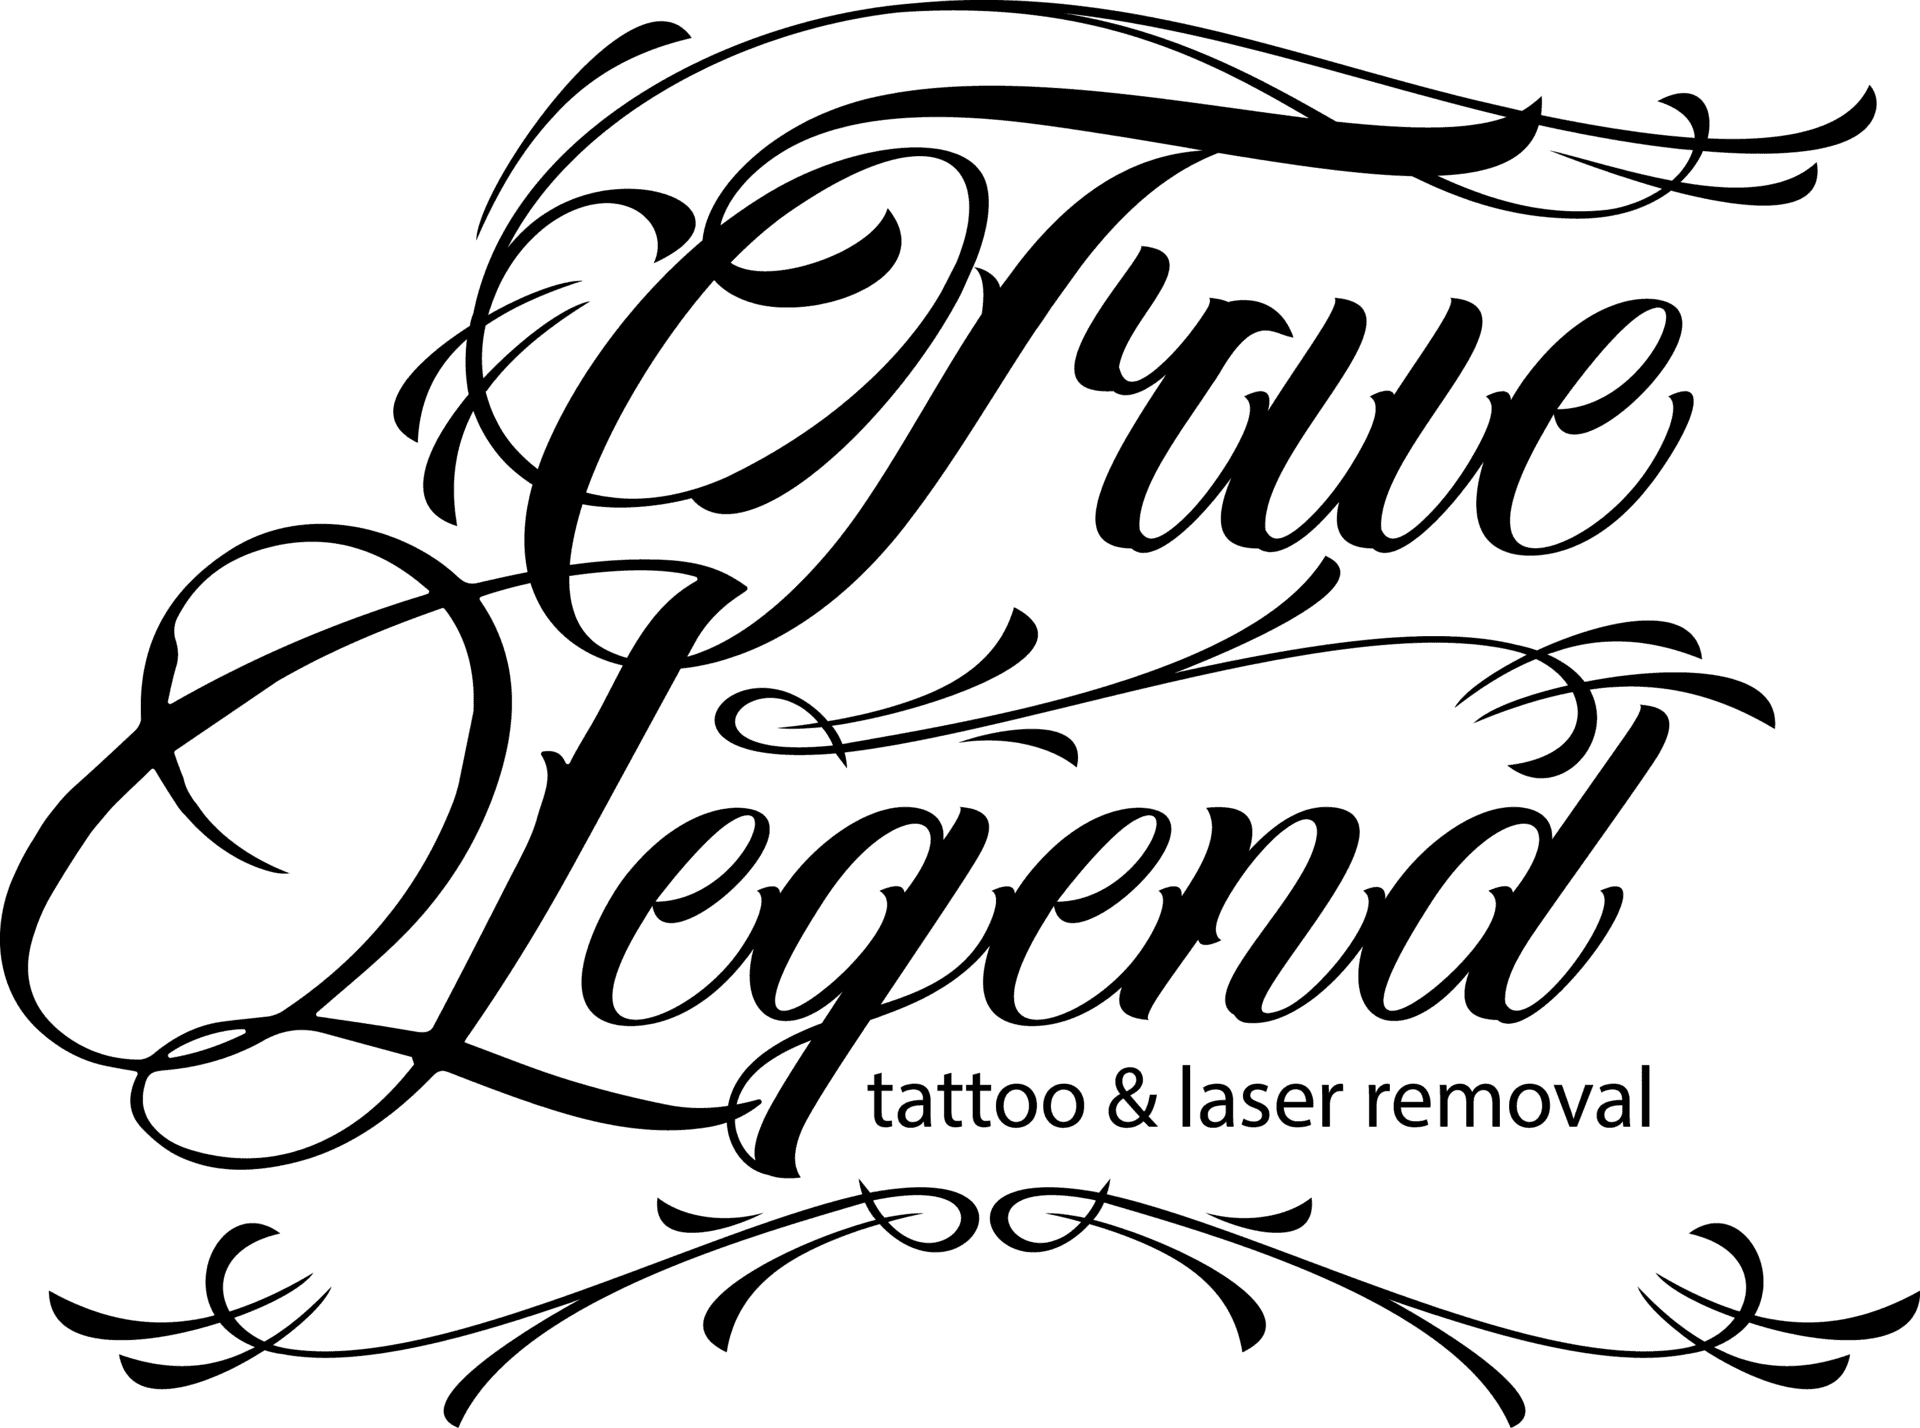 True Legend Tattoo Amp Laser Studio Guildford Surrey